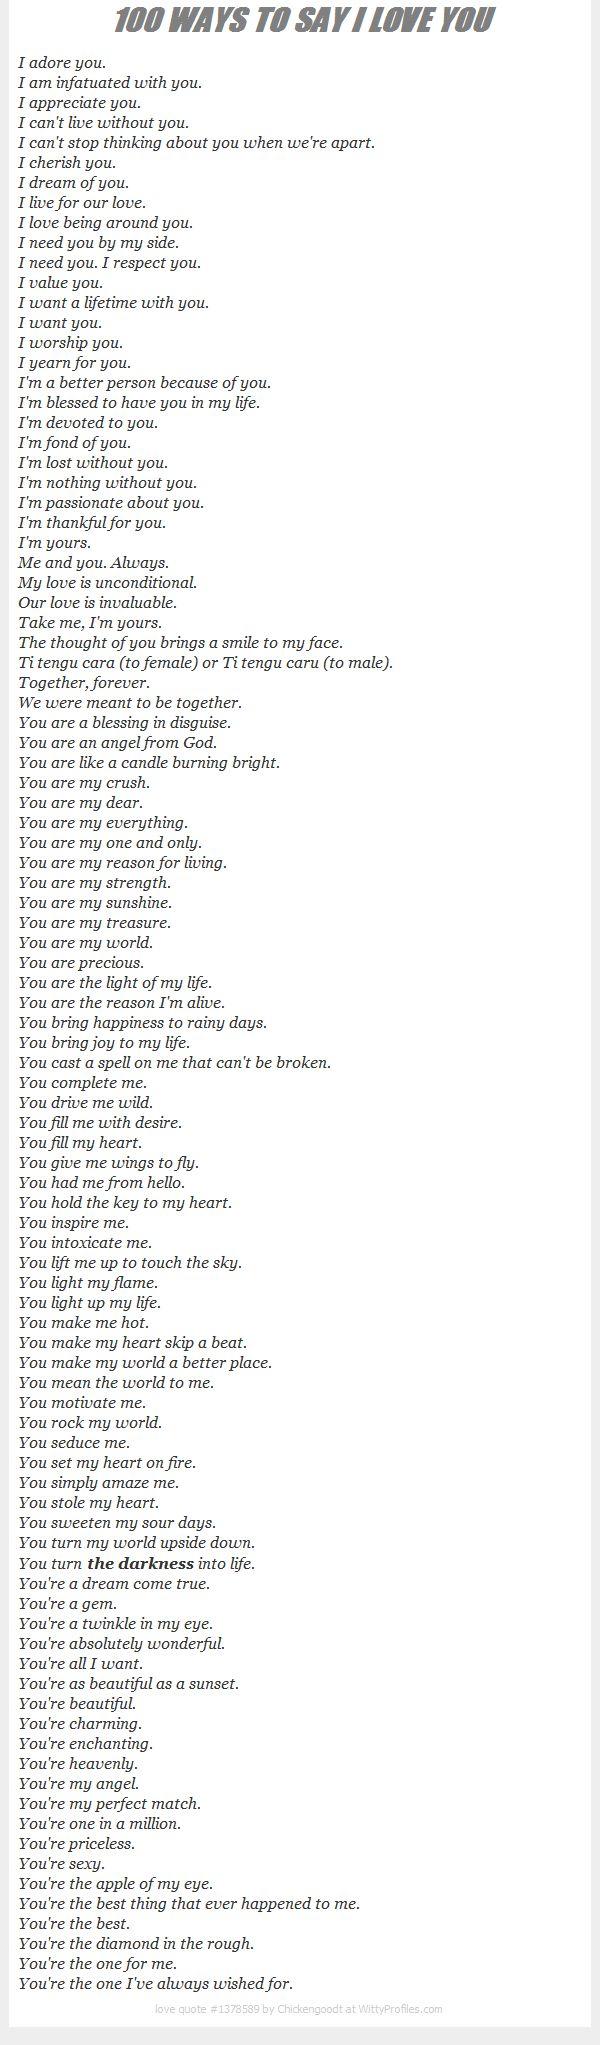 Bahasa Inggris Aku cinta kamu selain i love you